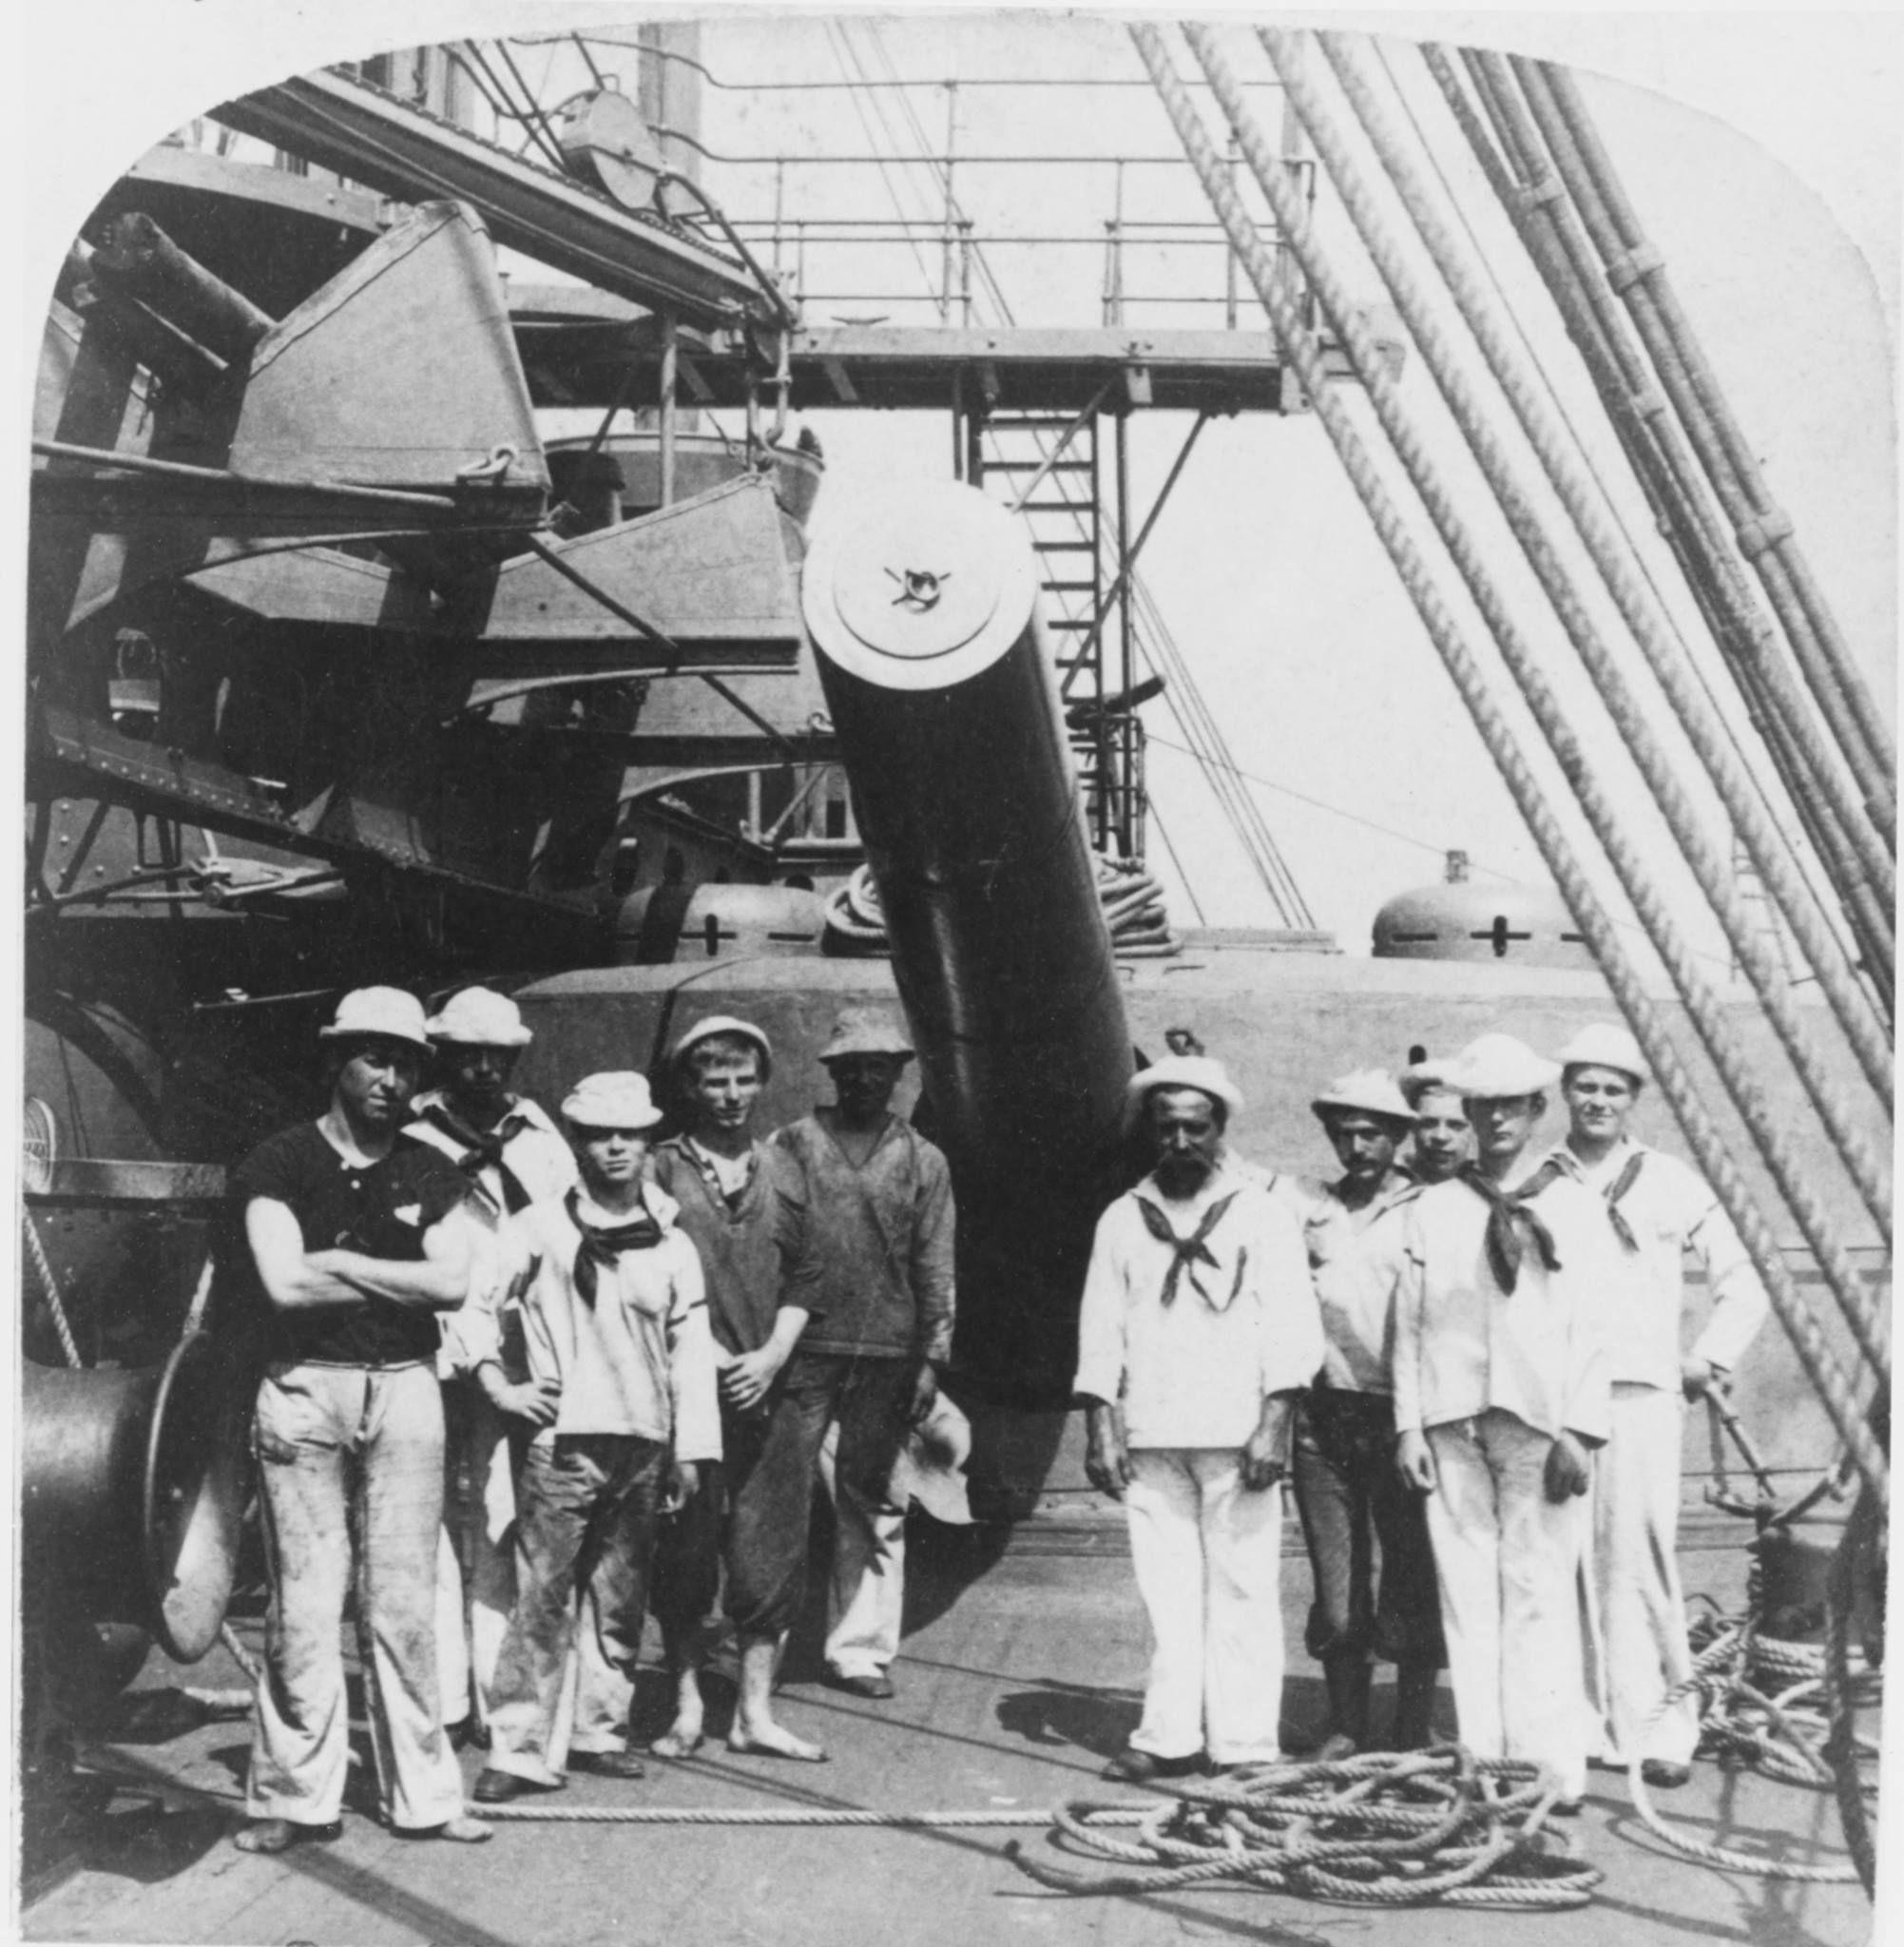 USS Texas crewmen pose in front of the battleship's port